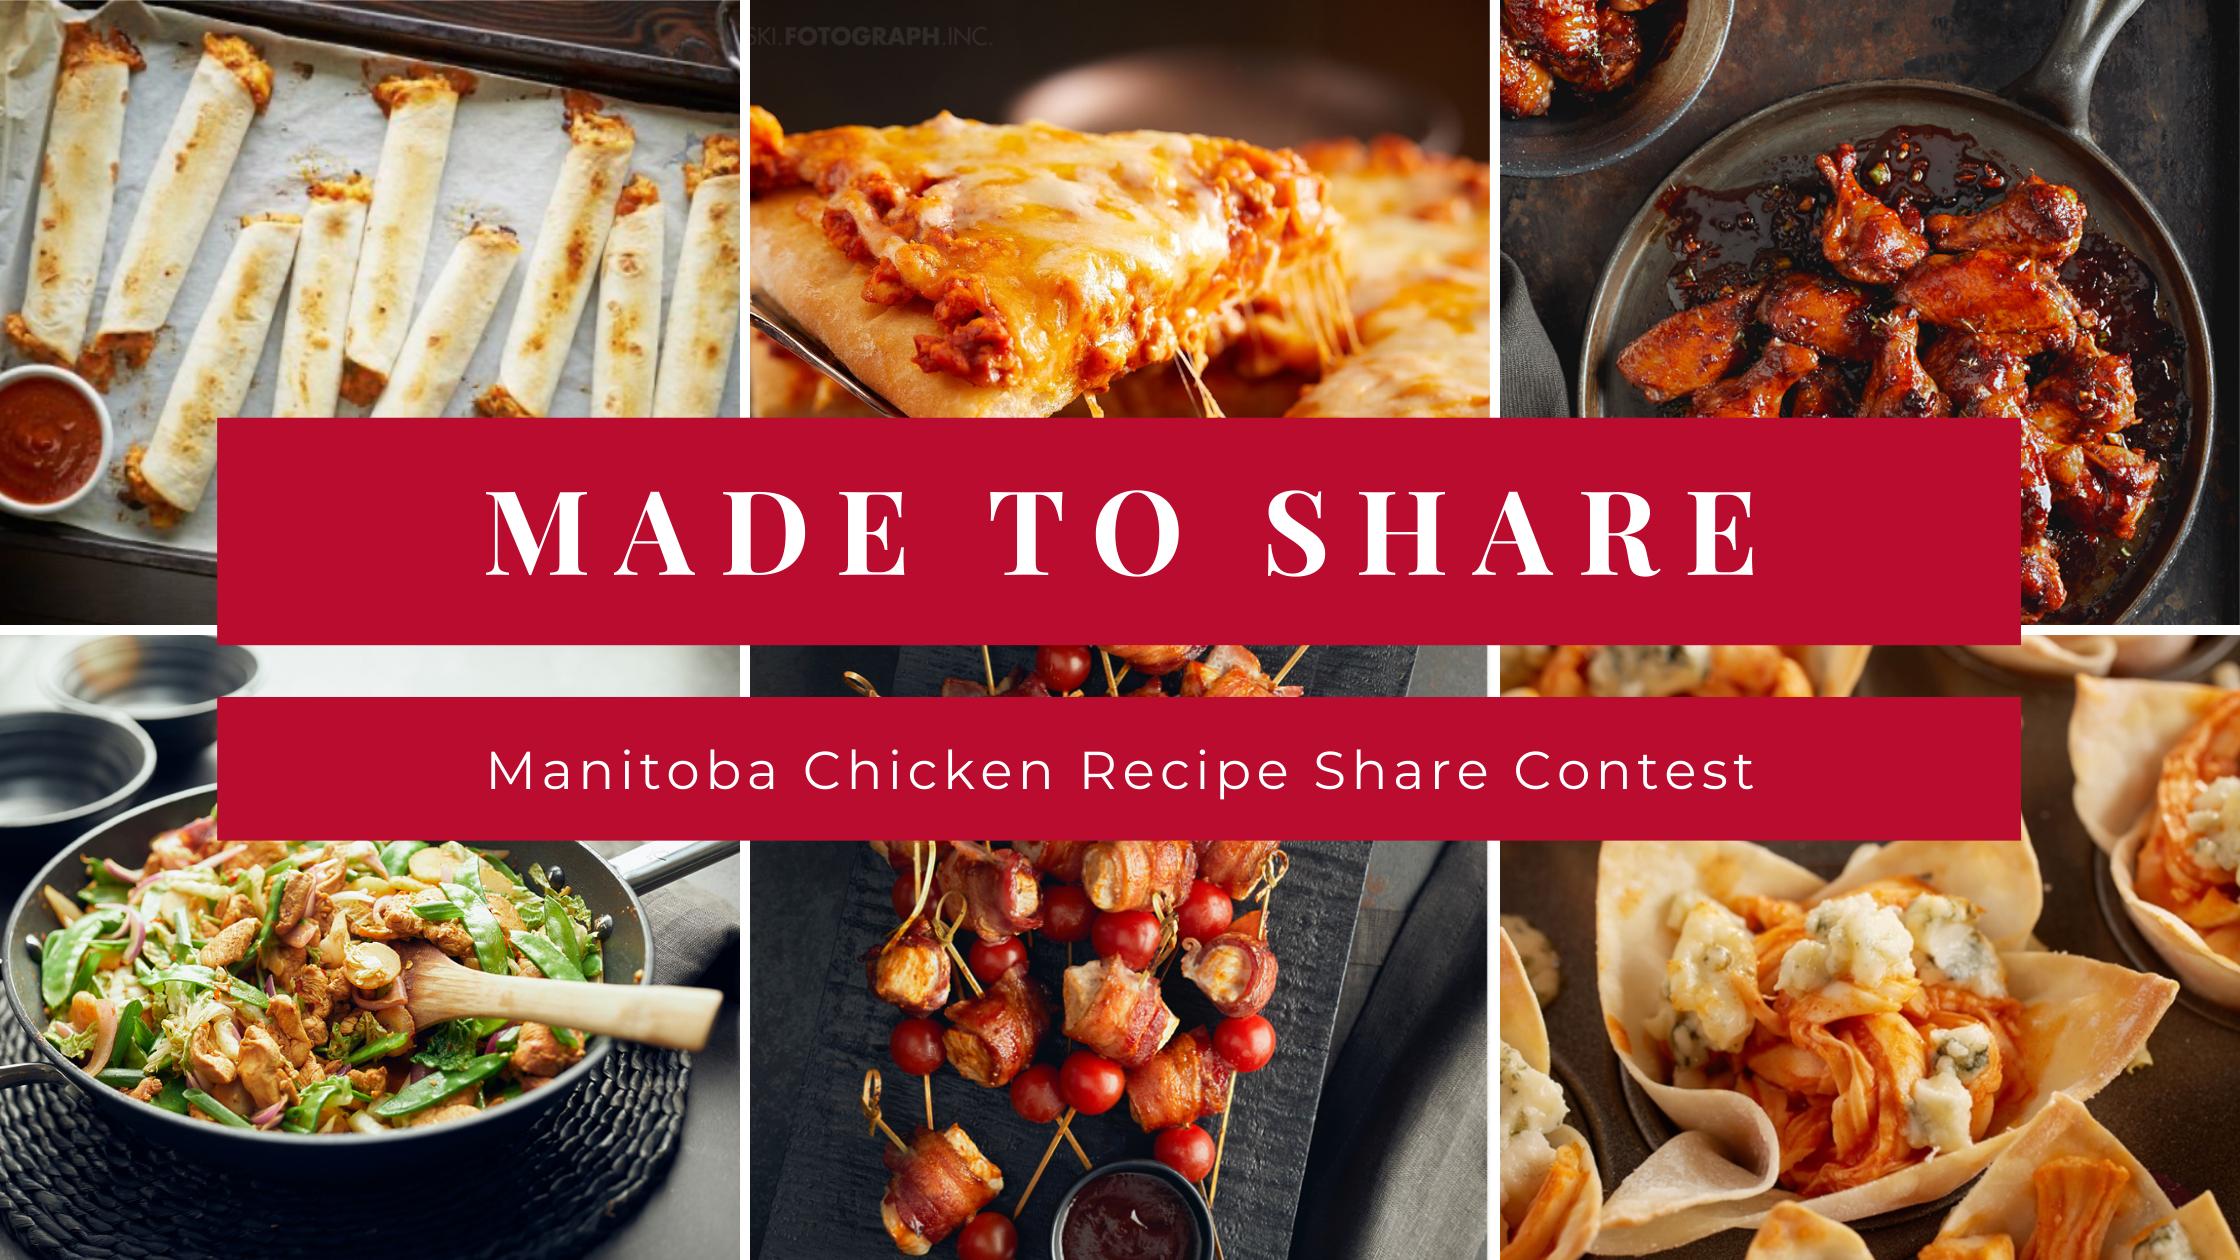 Manitoba Chicken Made to Share Recipe Contest